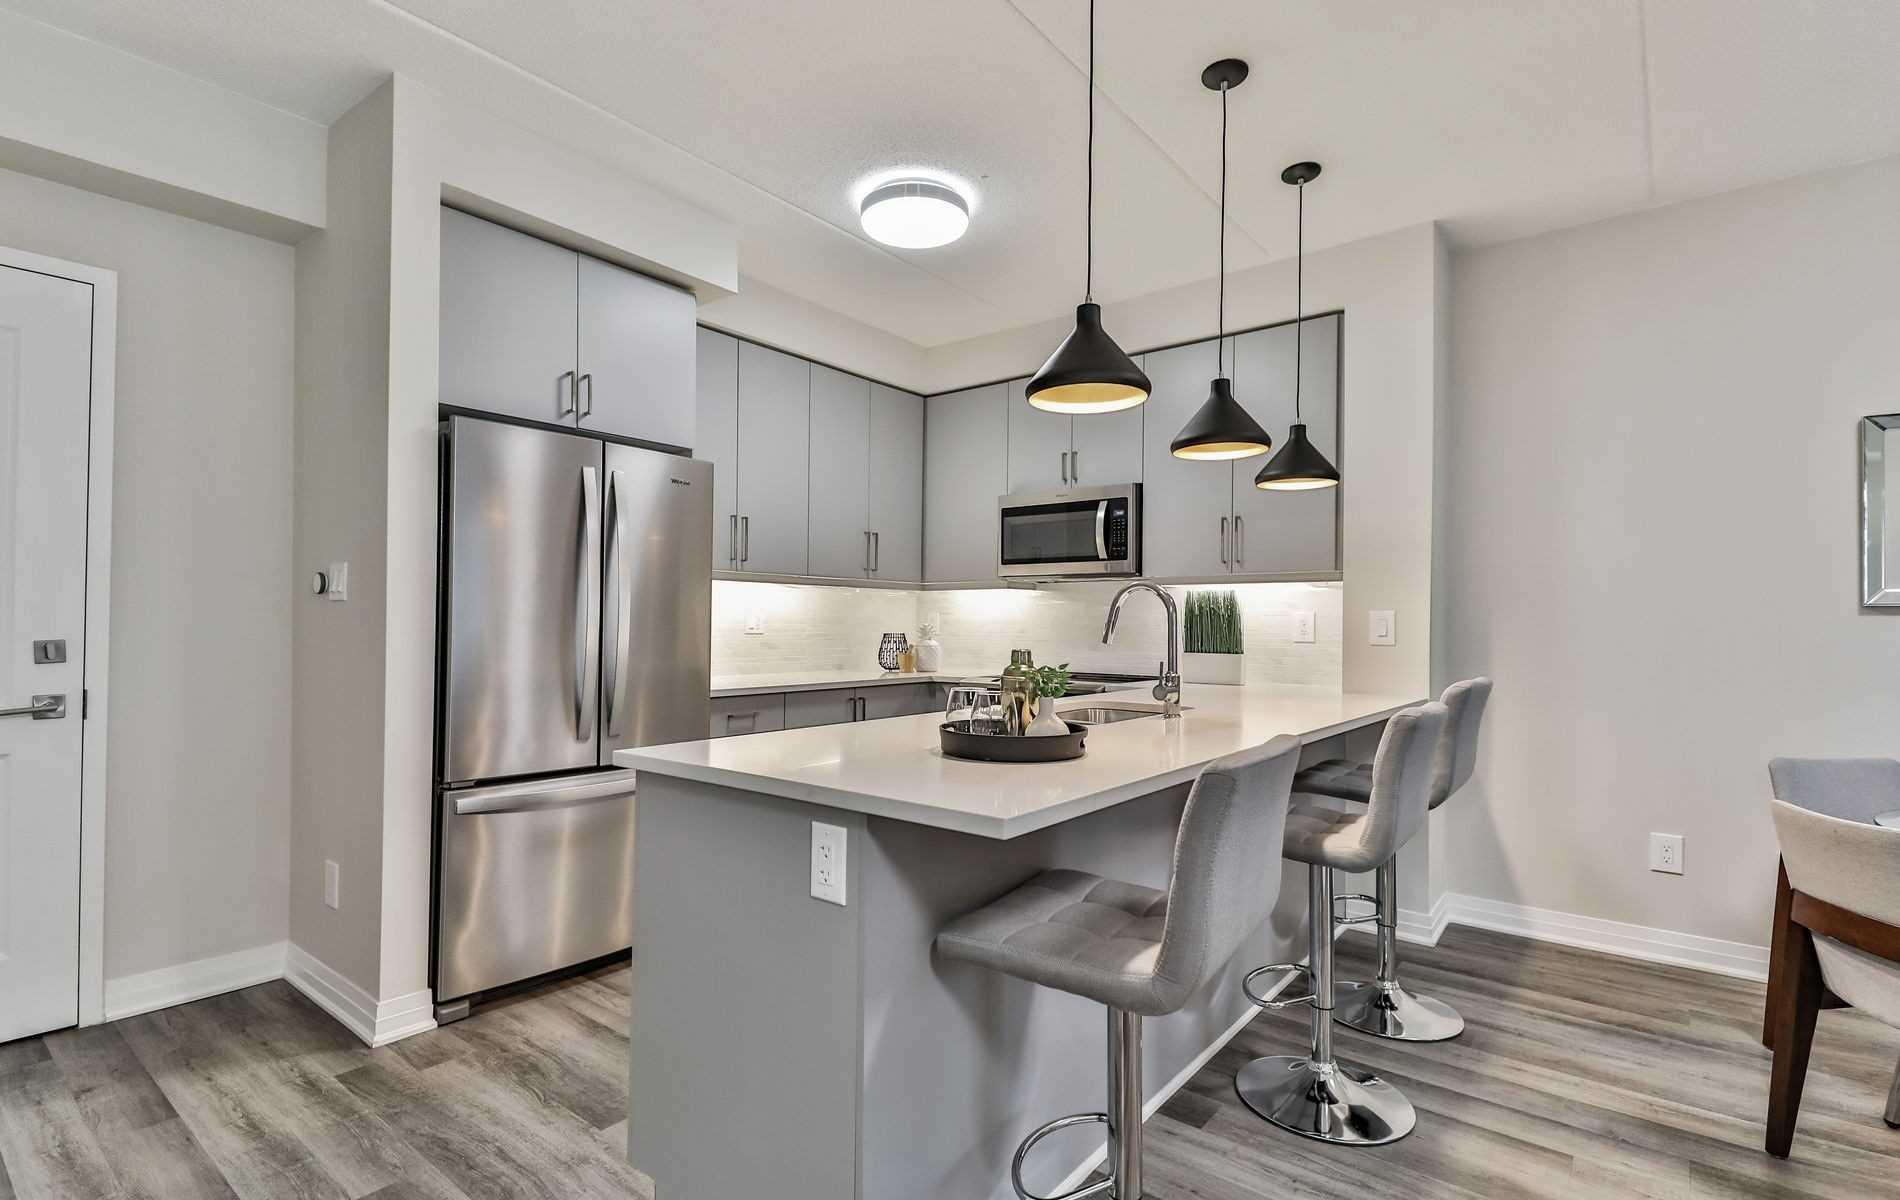 316 - 610 Farmstead Dr - Willmont Condo Apt for sale, 2 Bedrooms (W5399854) - #12